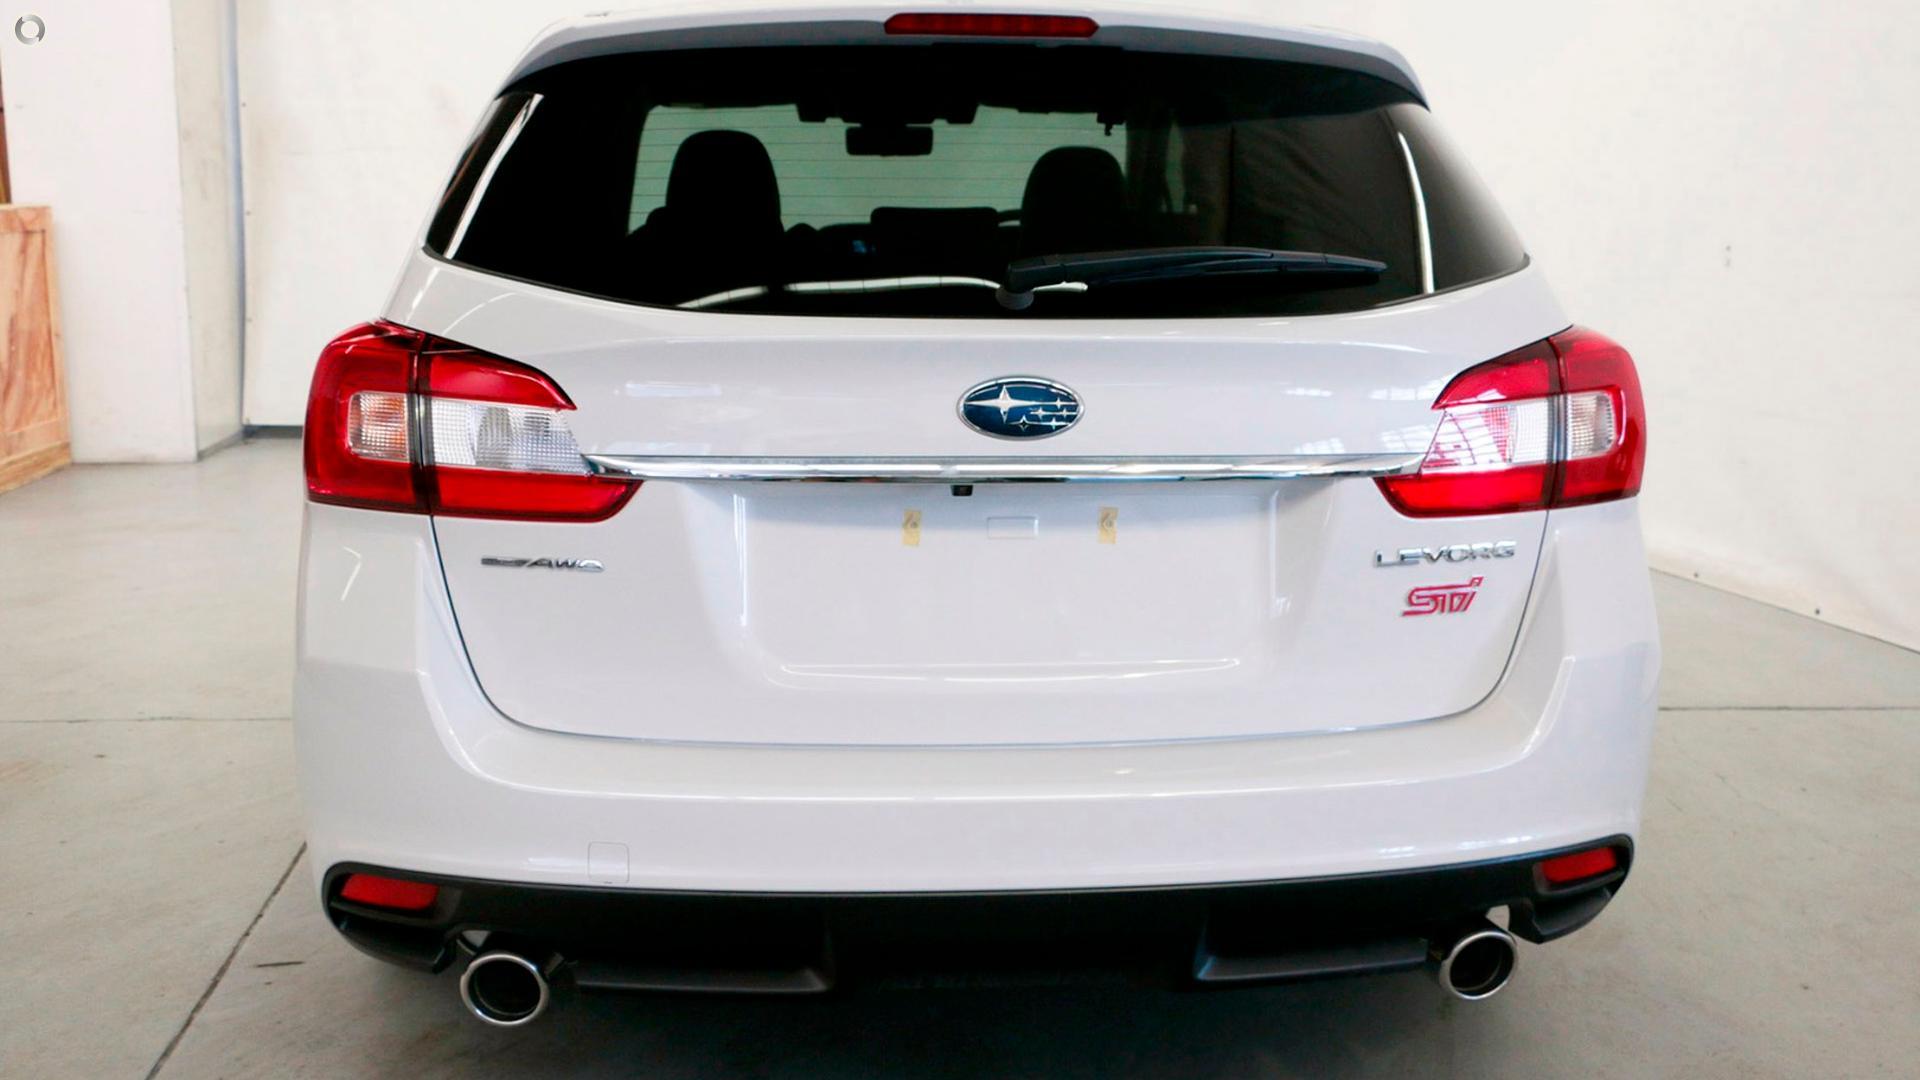 2018 Subaru Levorg 2.0 STI Sport V1